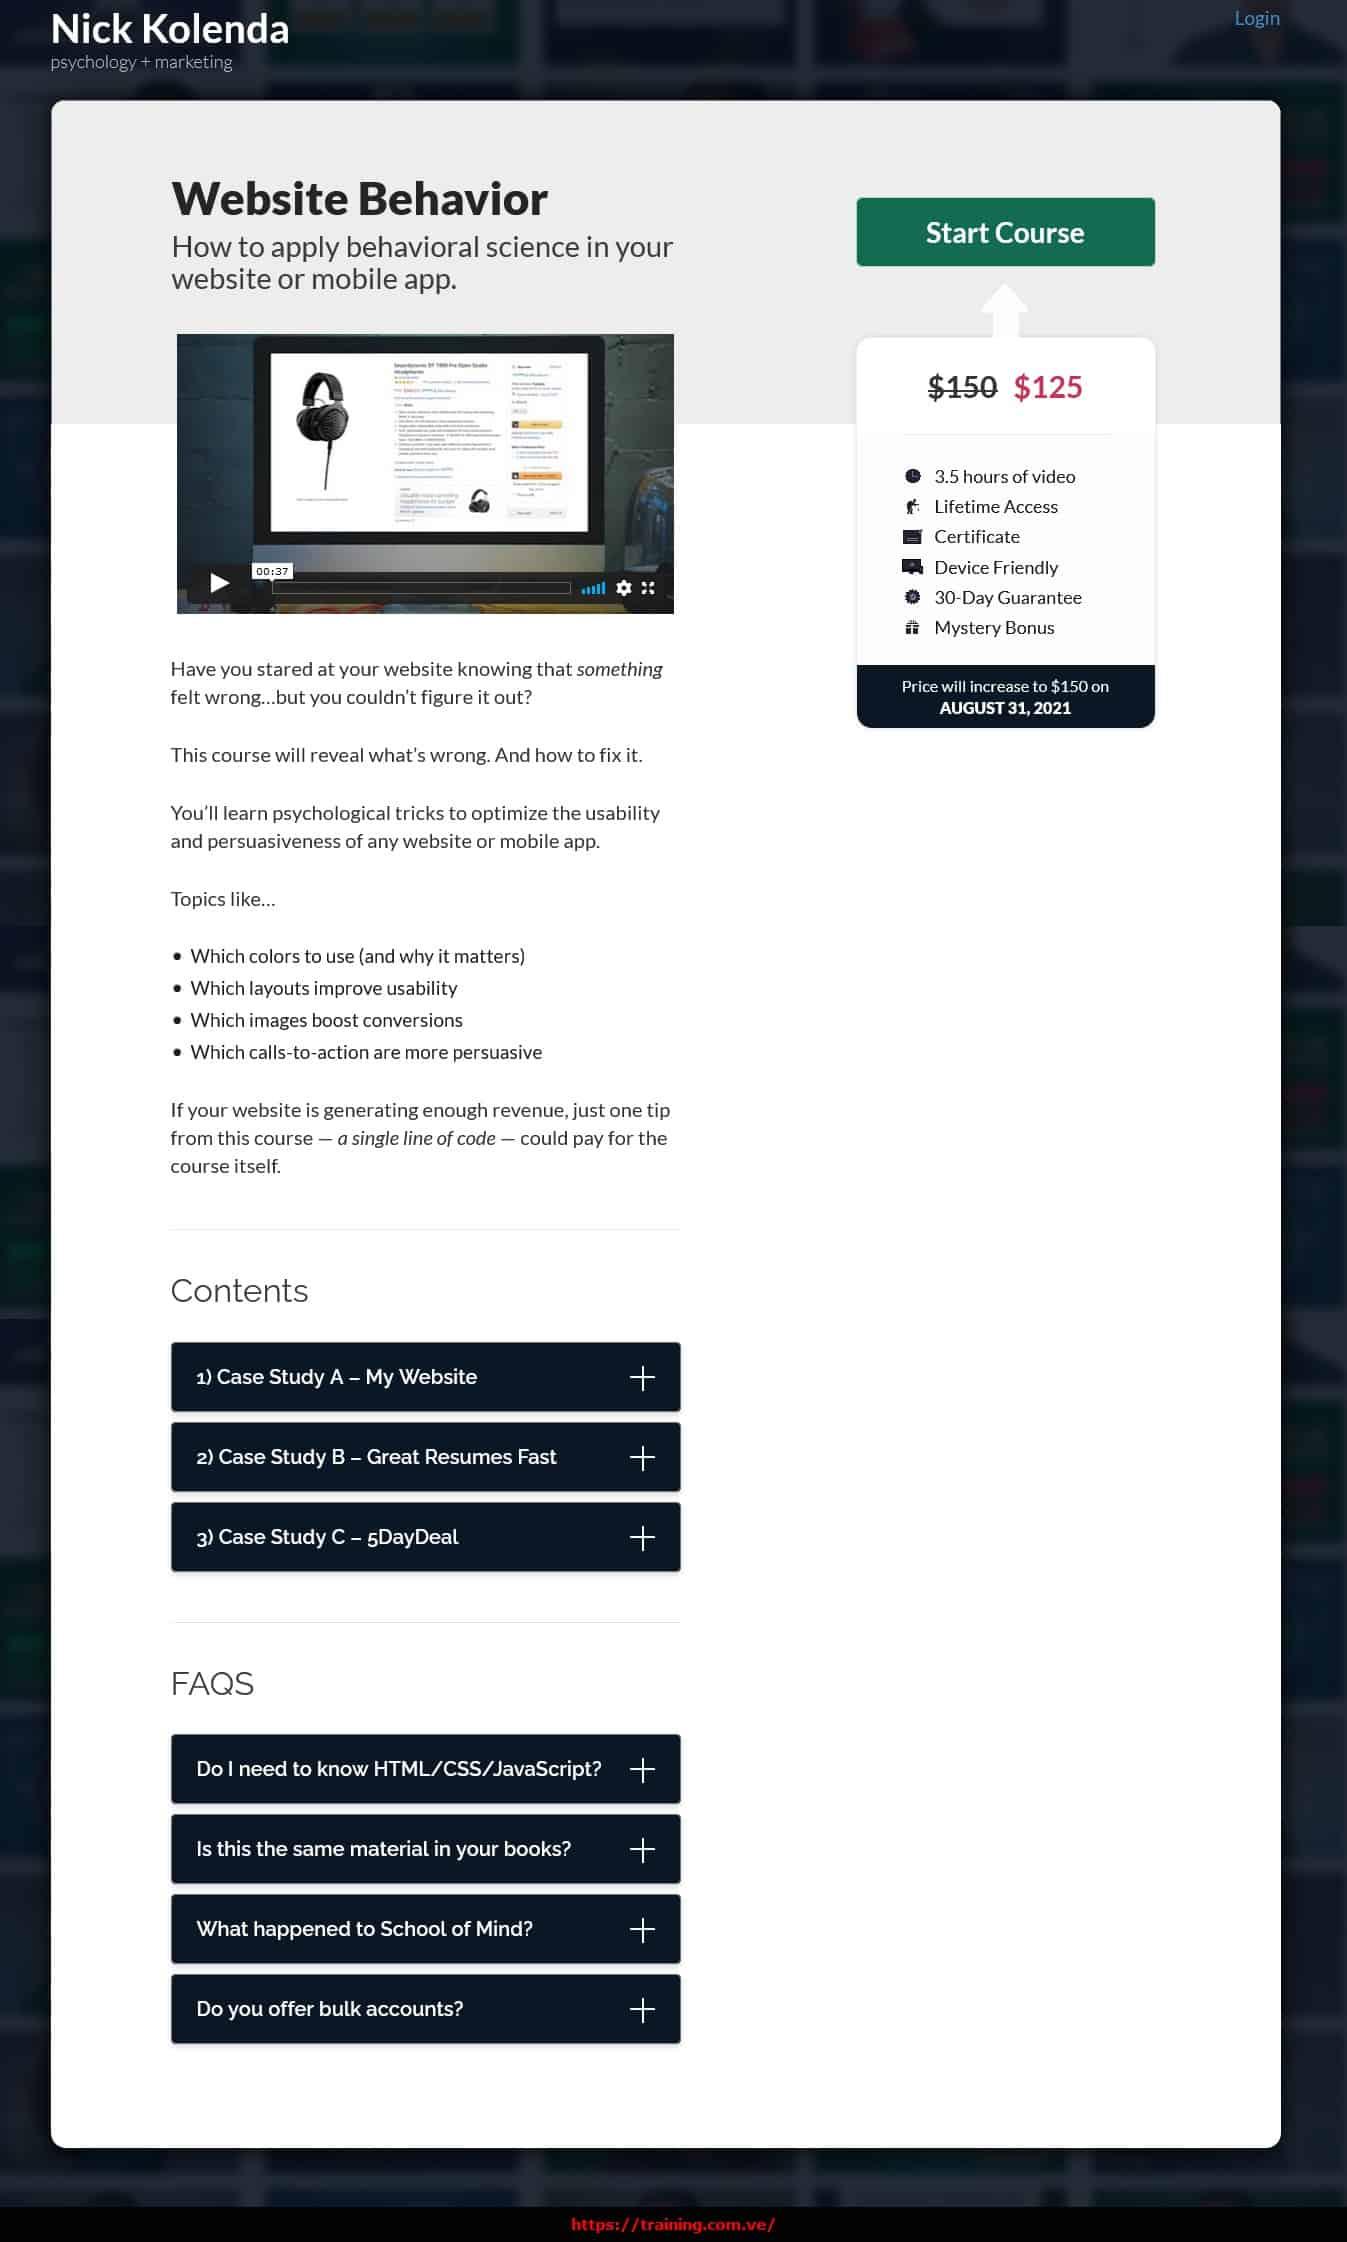 Website Behavior by Nick Kolenda sales page